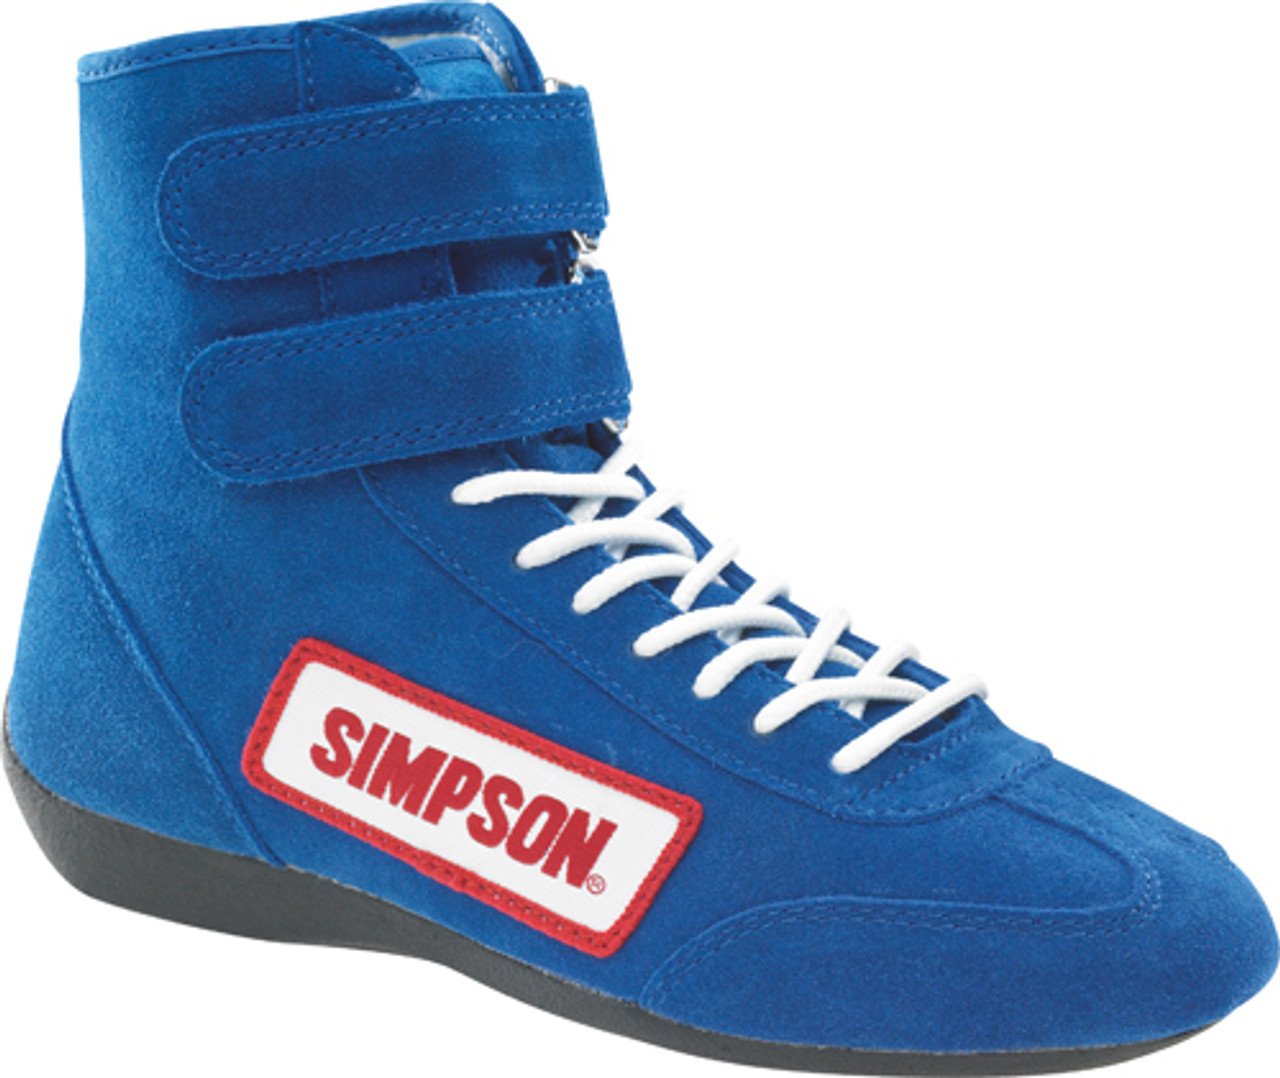 Simpson High Top Driver Shoes - SIM28000